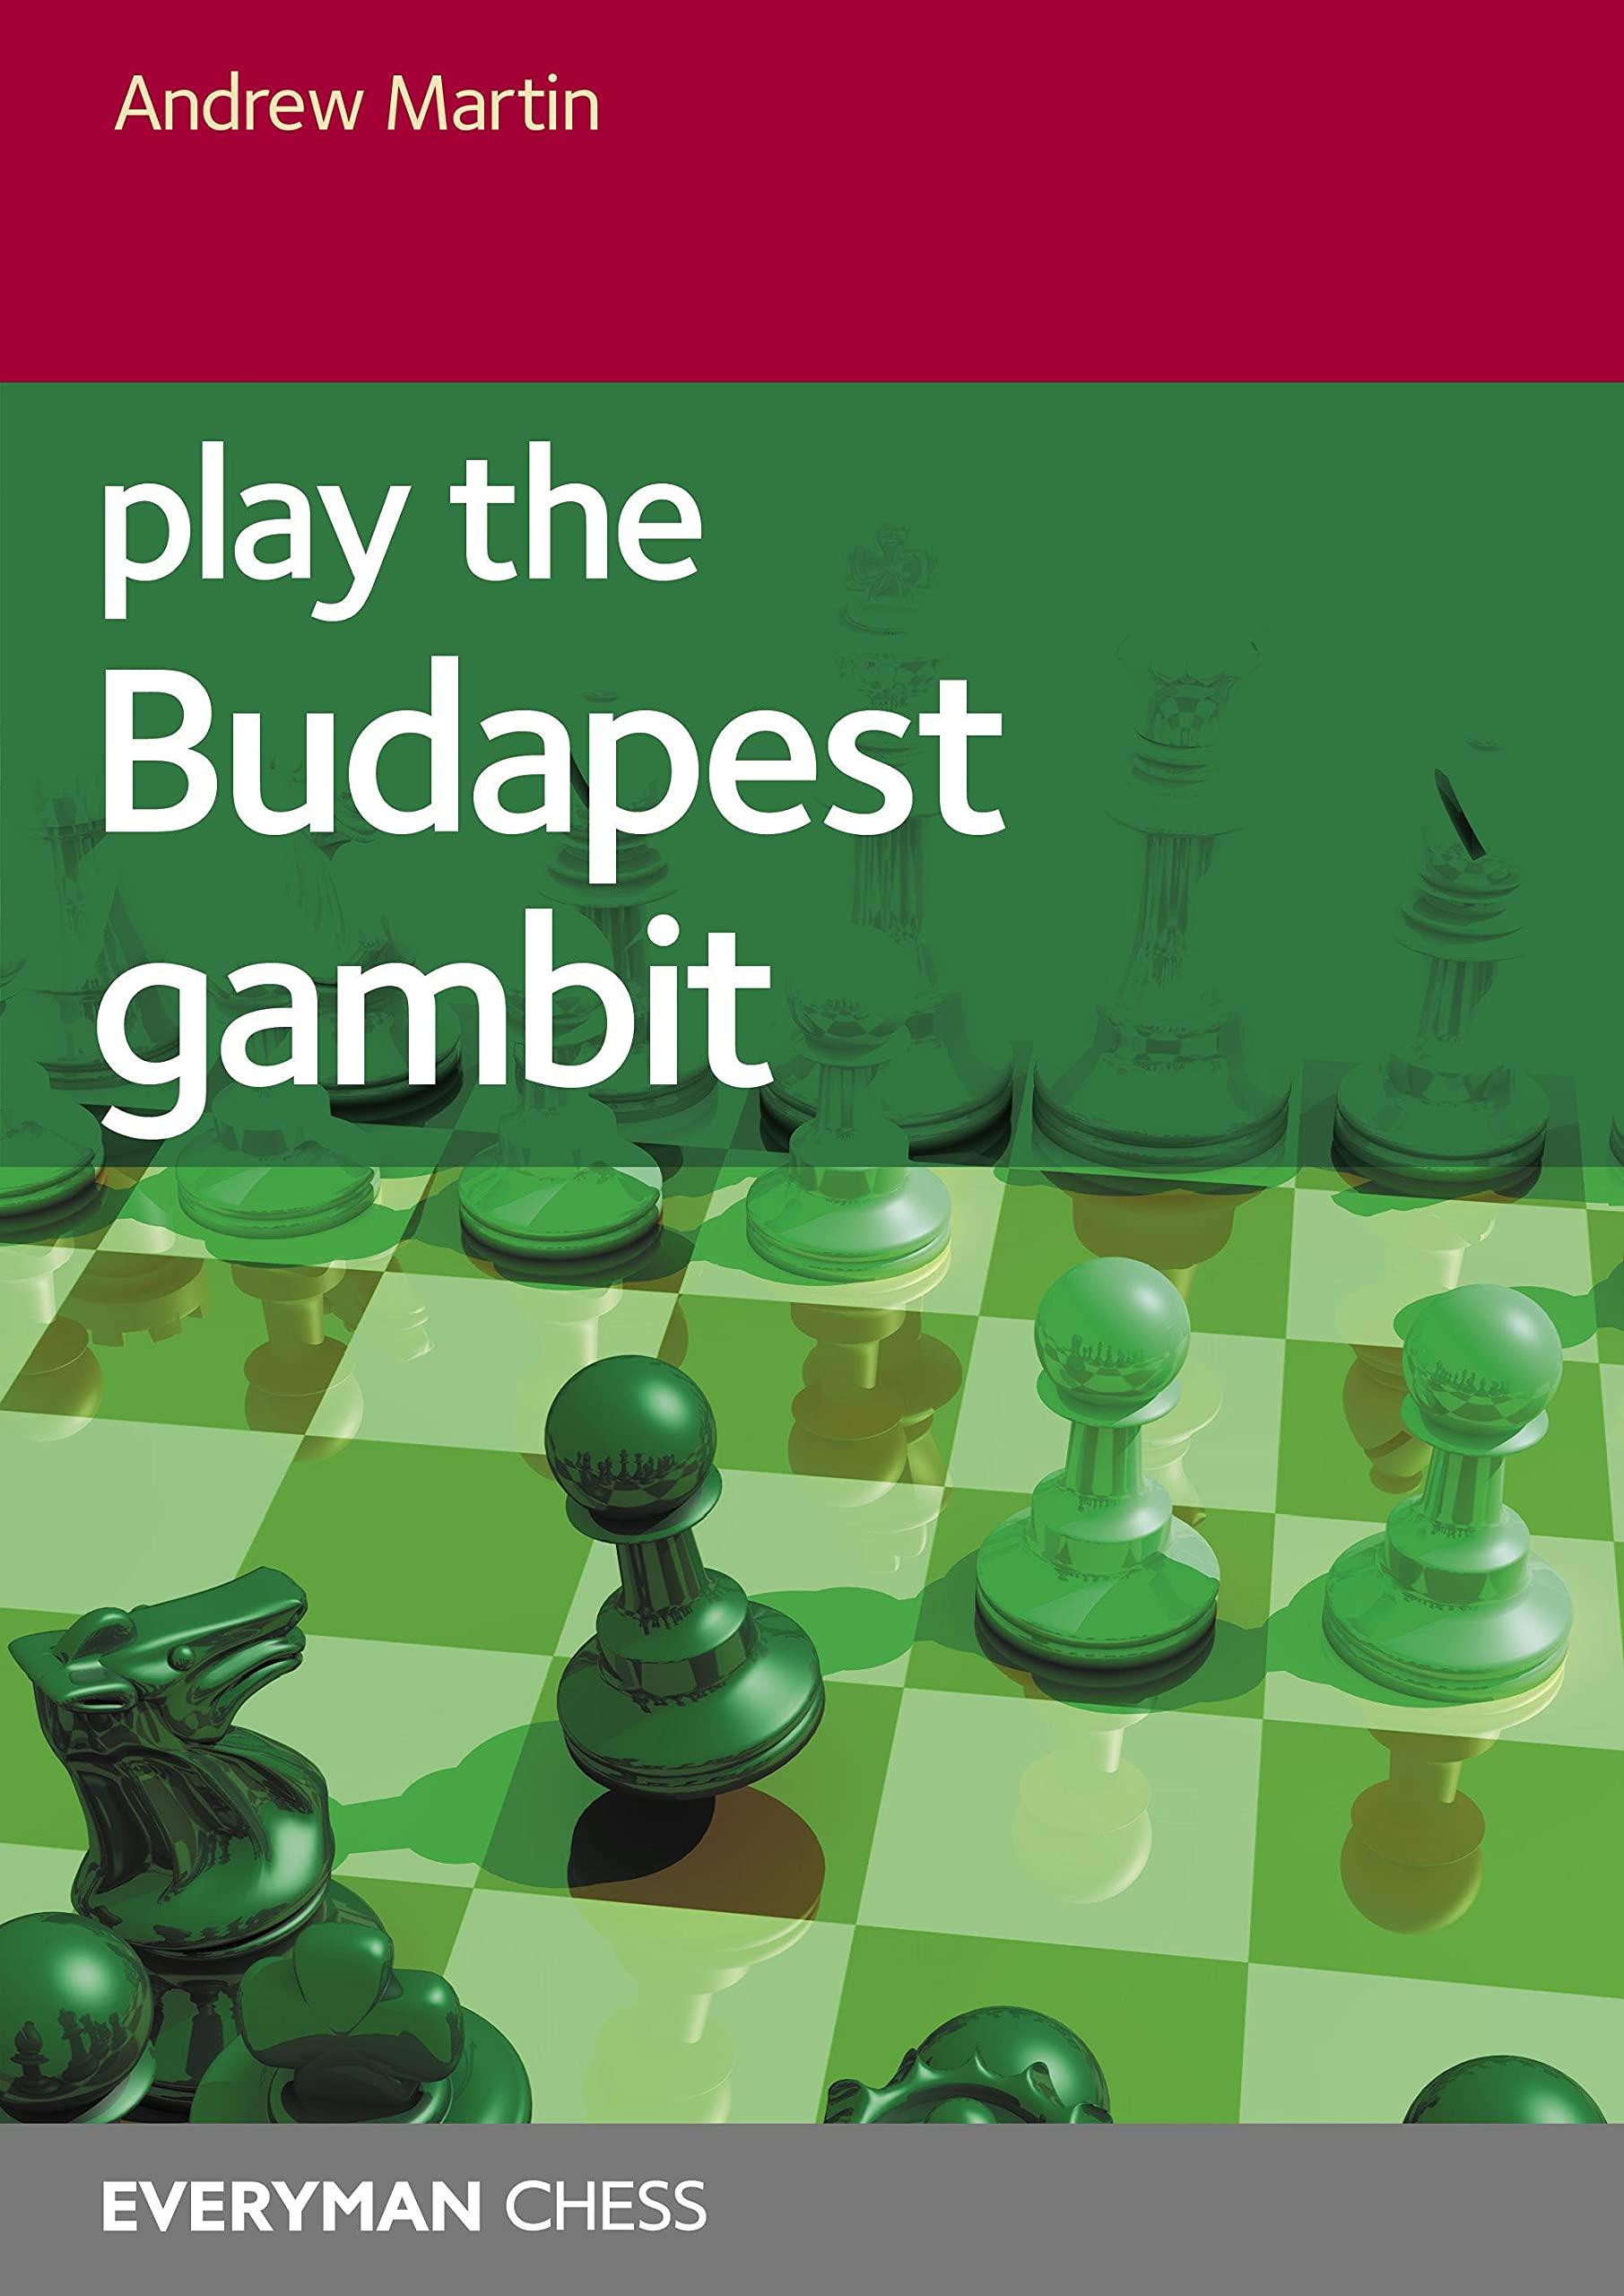 Play the Budapest Gambit, Andrew Martin, Everyman Chess, May 2021, ISBN-13 : 978-1781945889